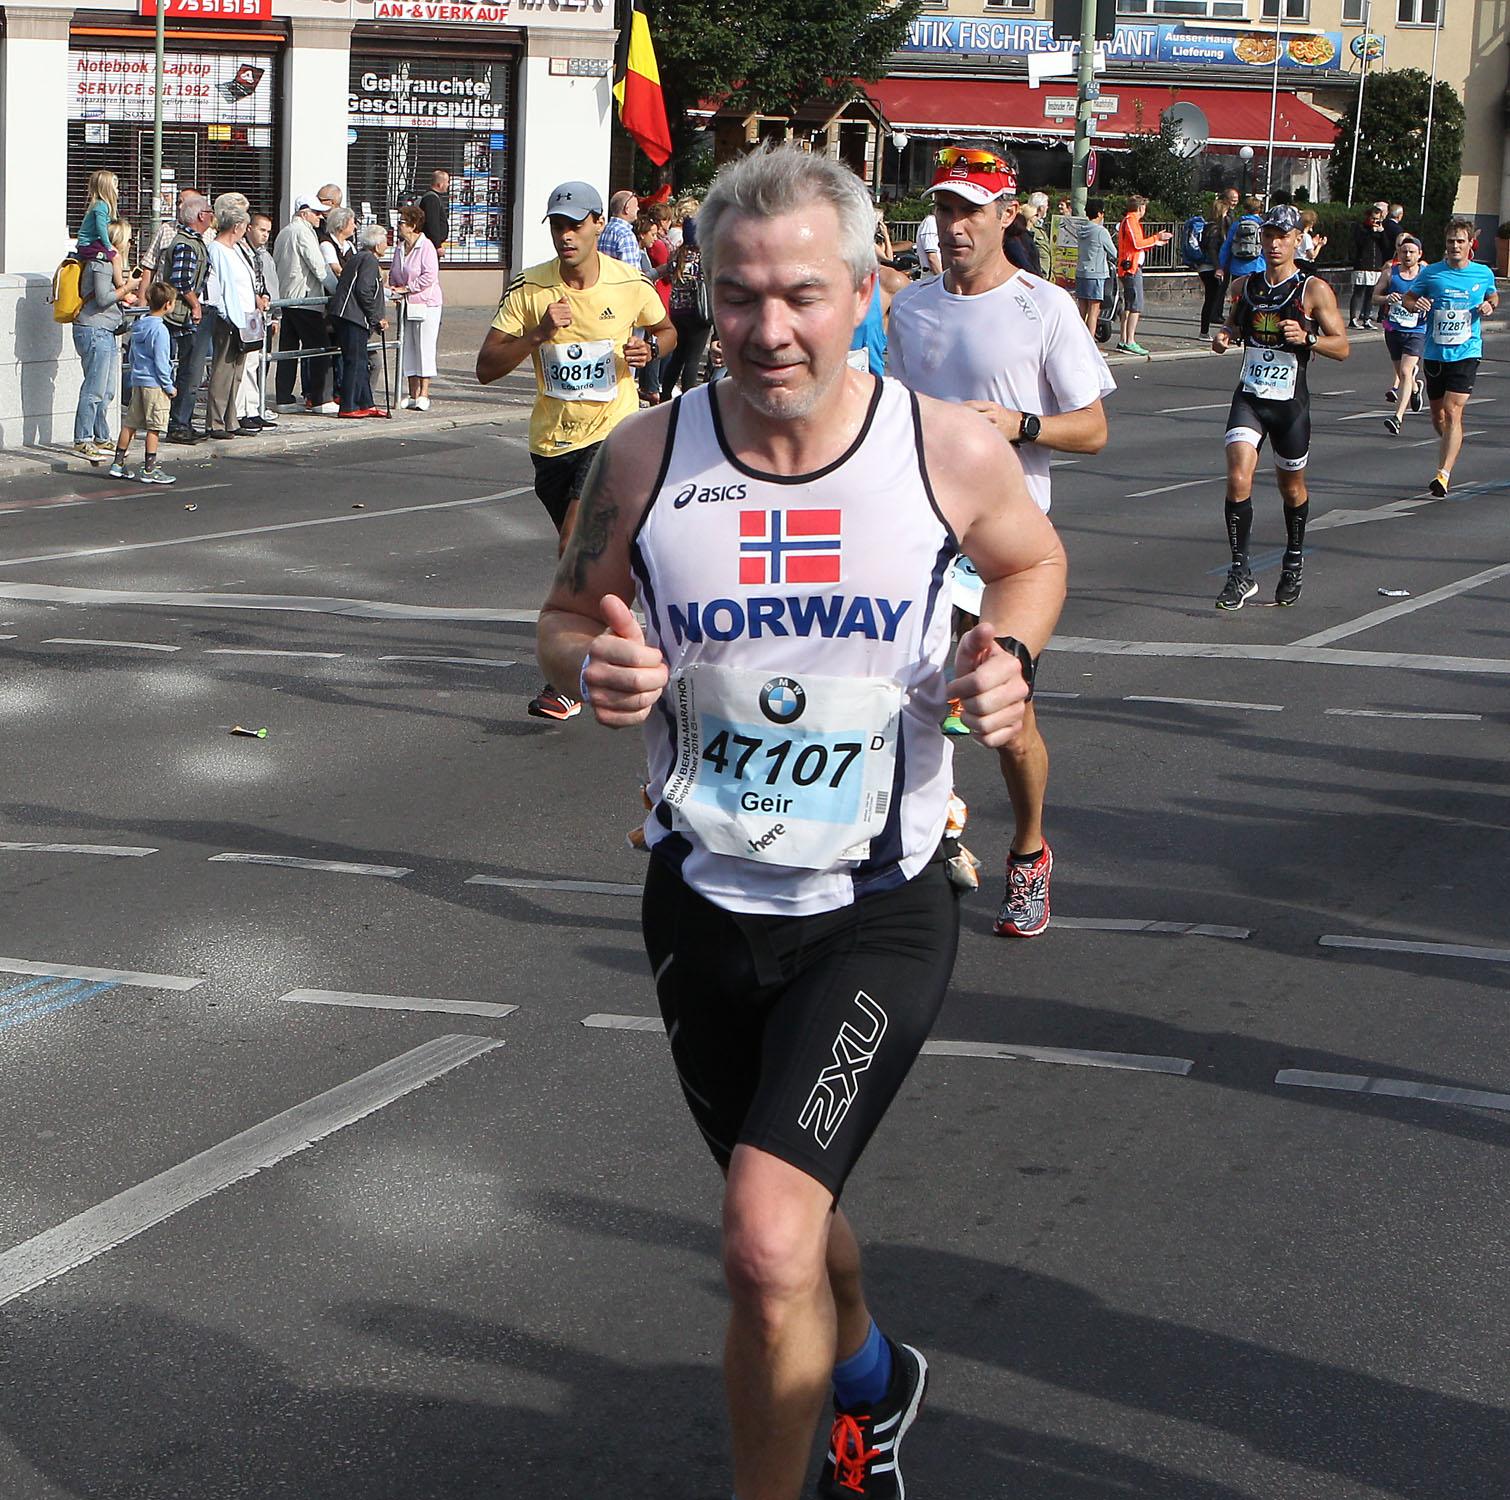 Foto: maraton.no - Egil Lehne